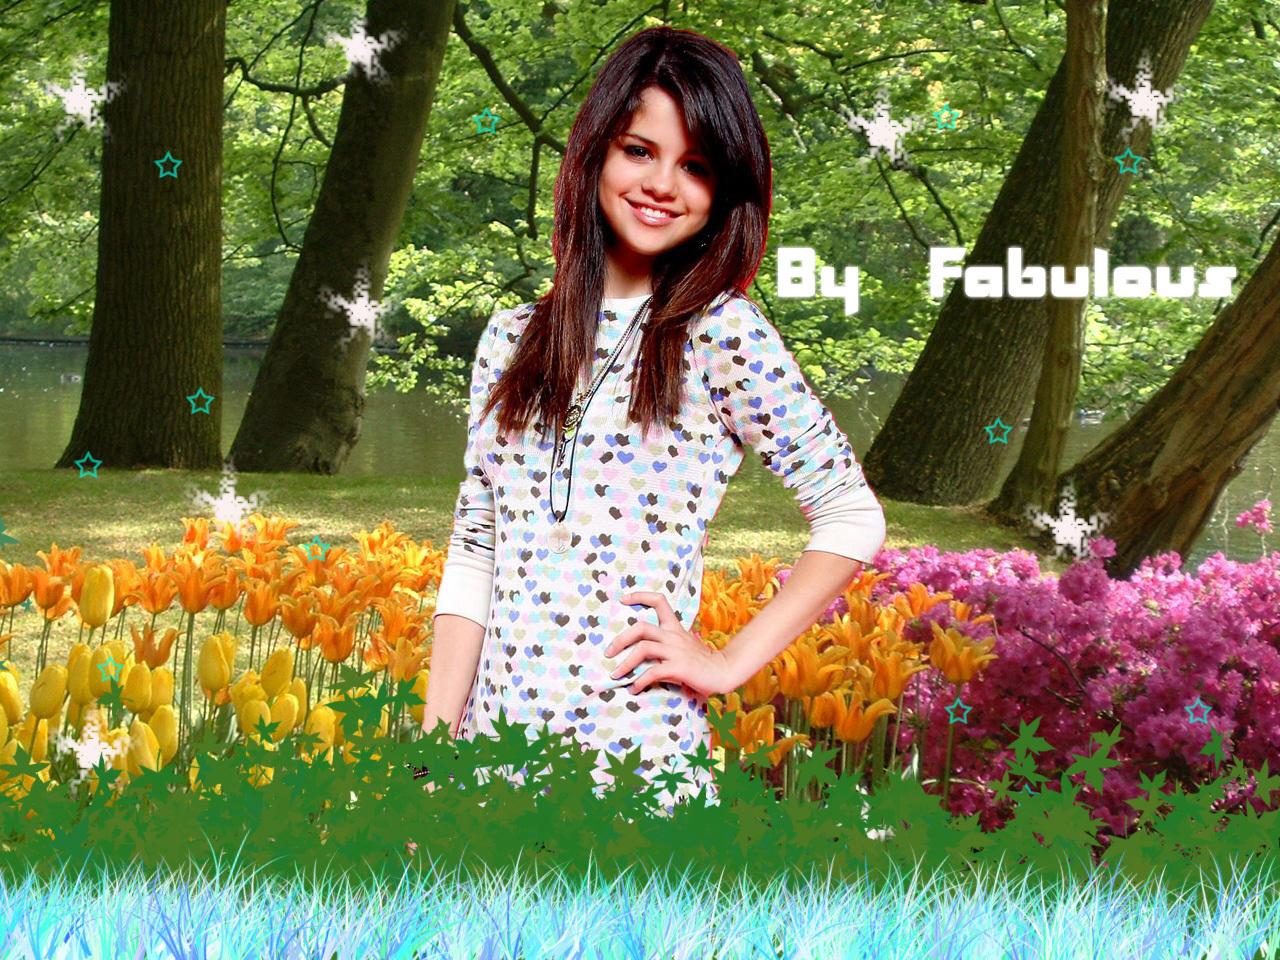 http://3.bp.blogspot.com/-9PY4CqBiYFw/TkjZ-wyHBzI/AAAAAAAAAbQ/F_-lwmmuBgg/s1600/Selena-Gomez-by-Fabulous-aka-Lil_beauty-selena-gomez-5780162-1280-960.jpg